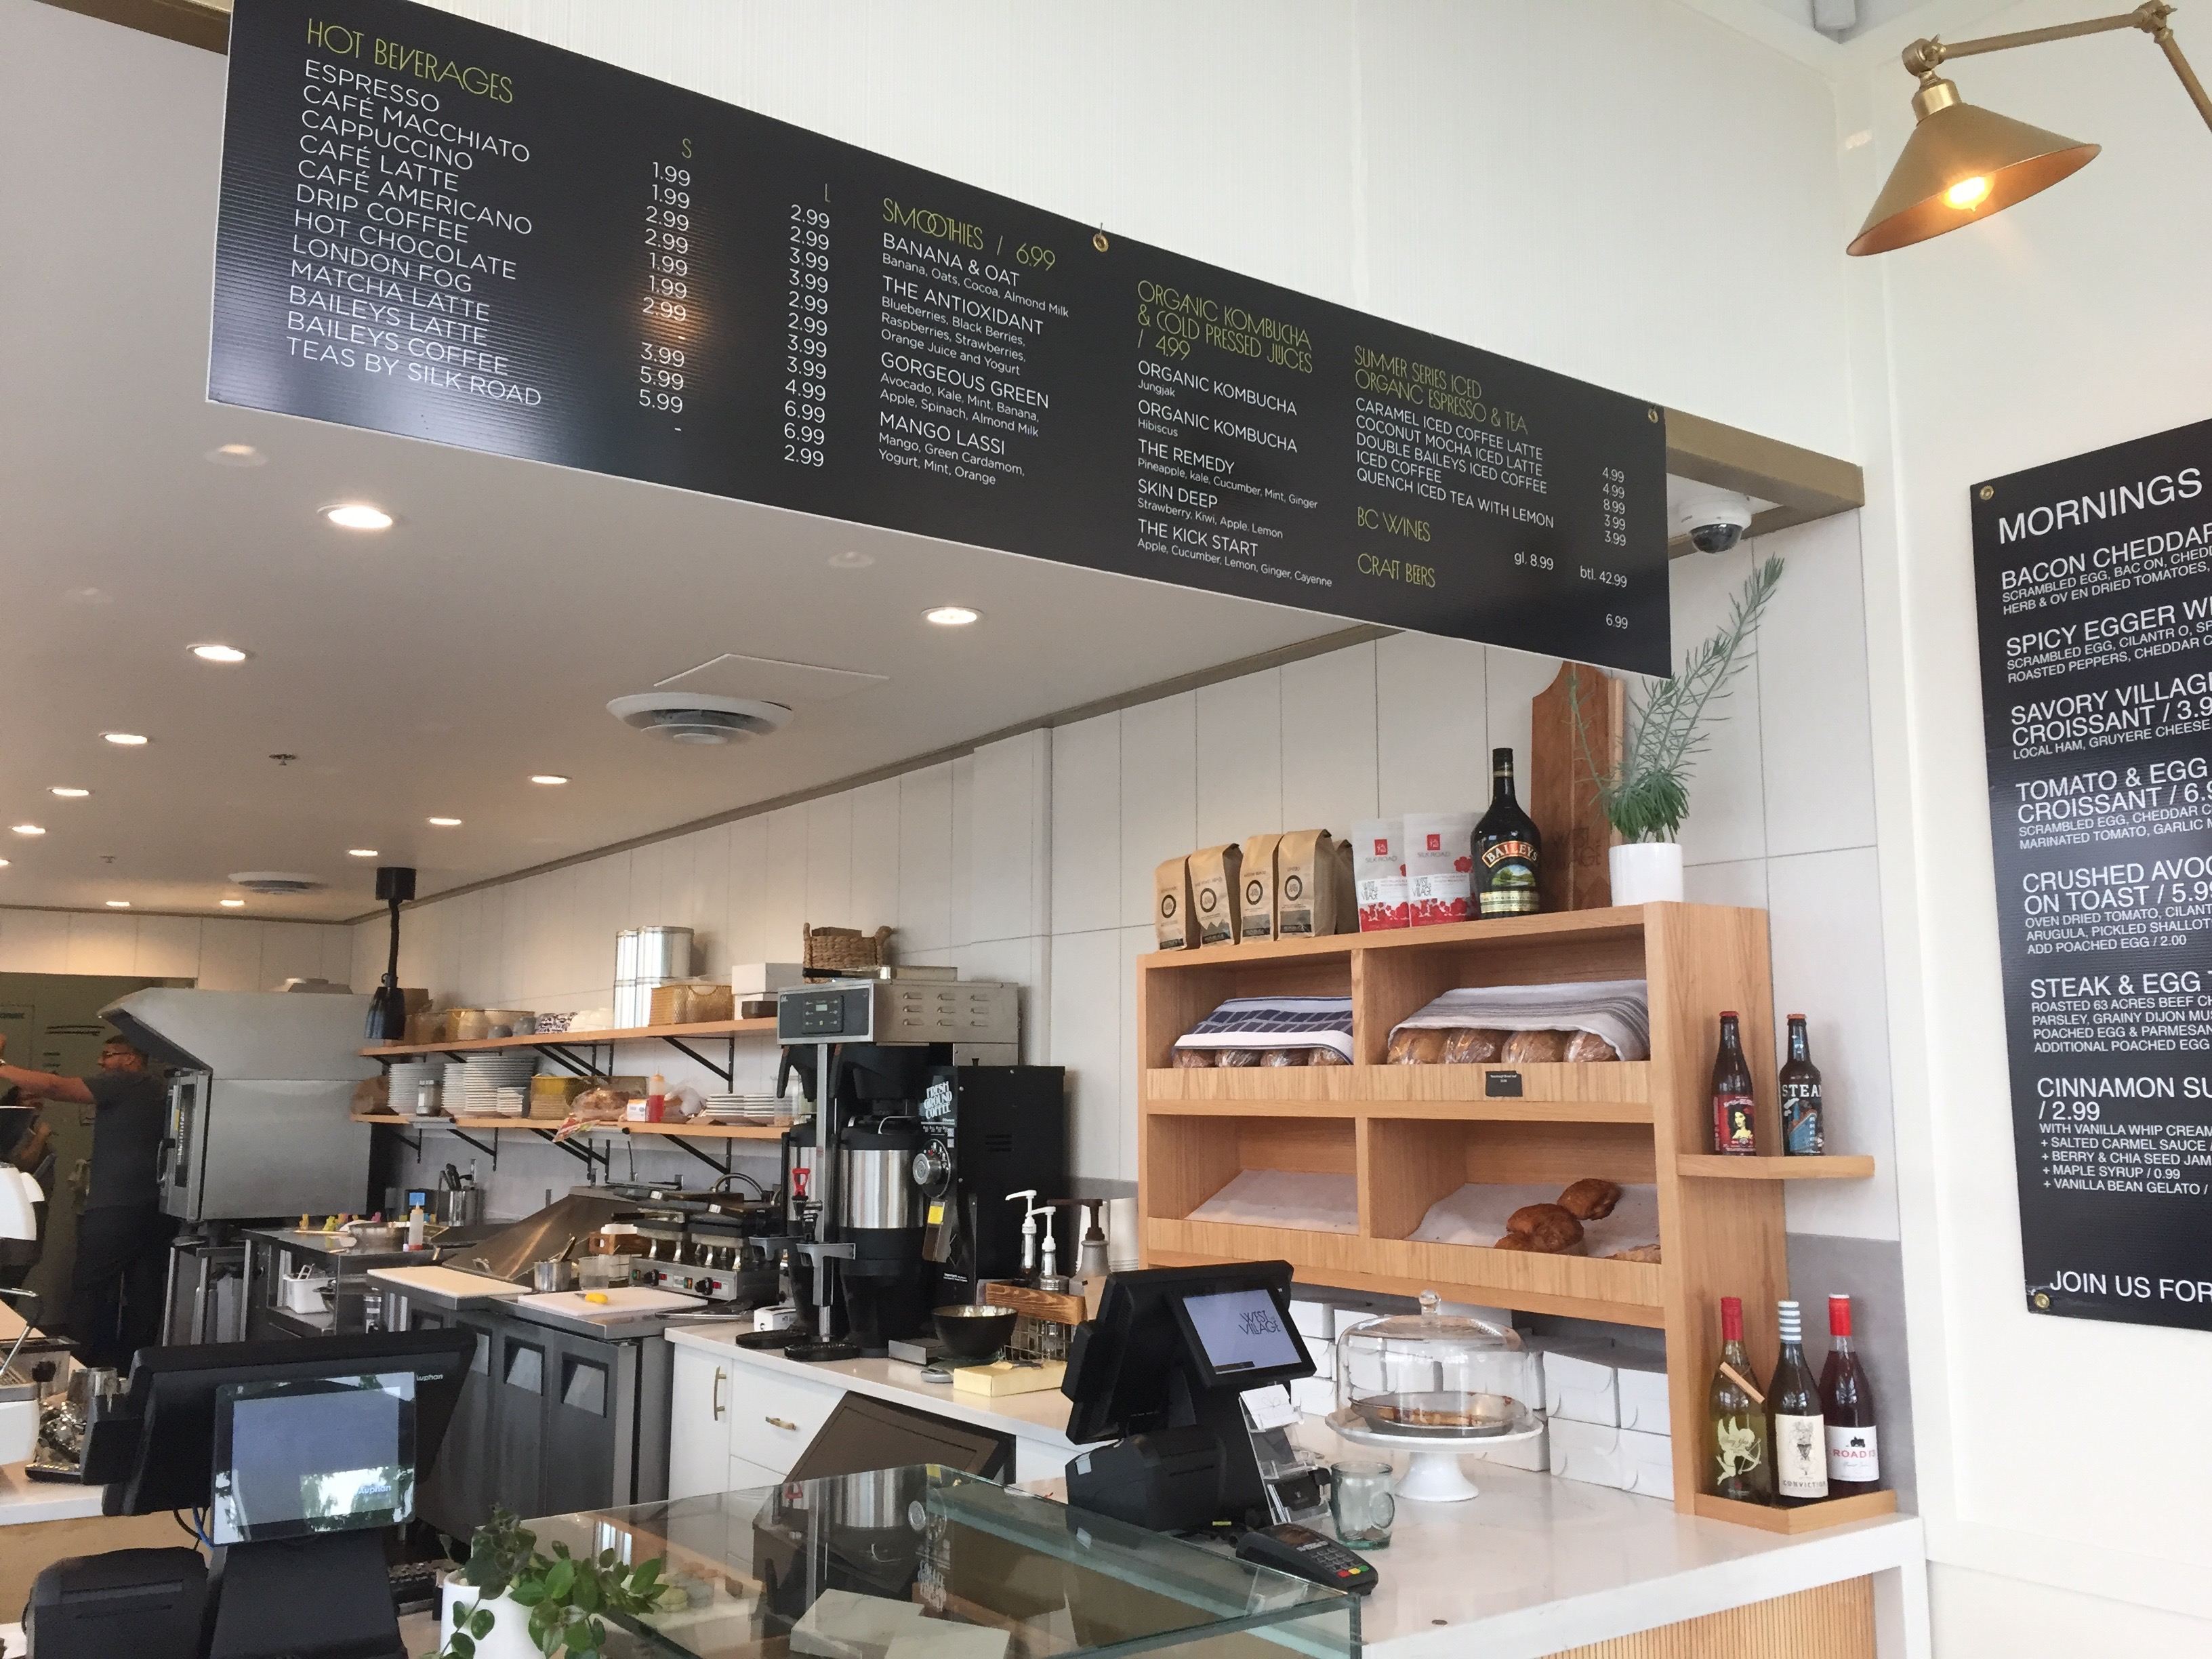 West Village Cafe Food Area and Drink Menu